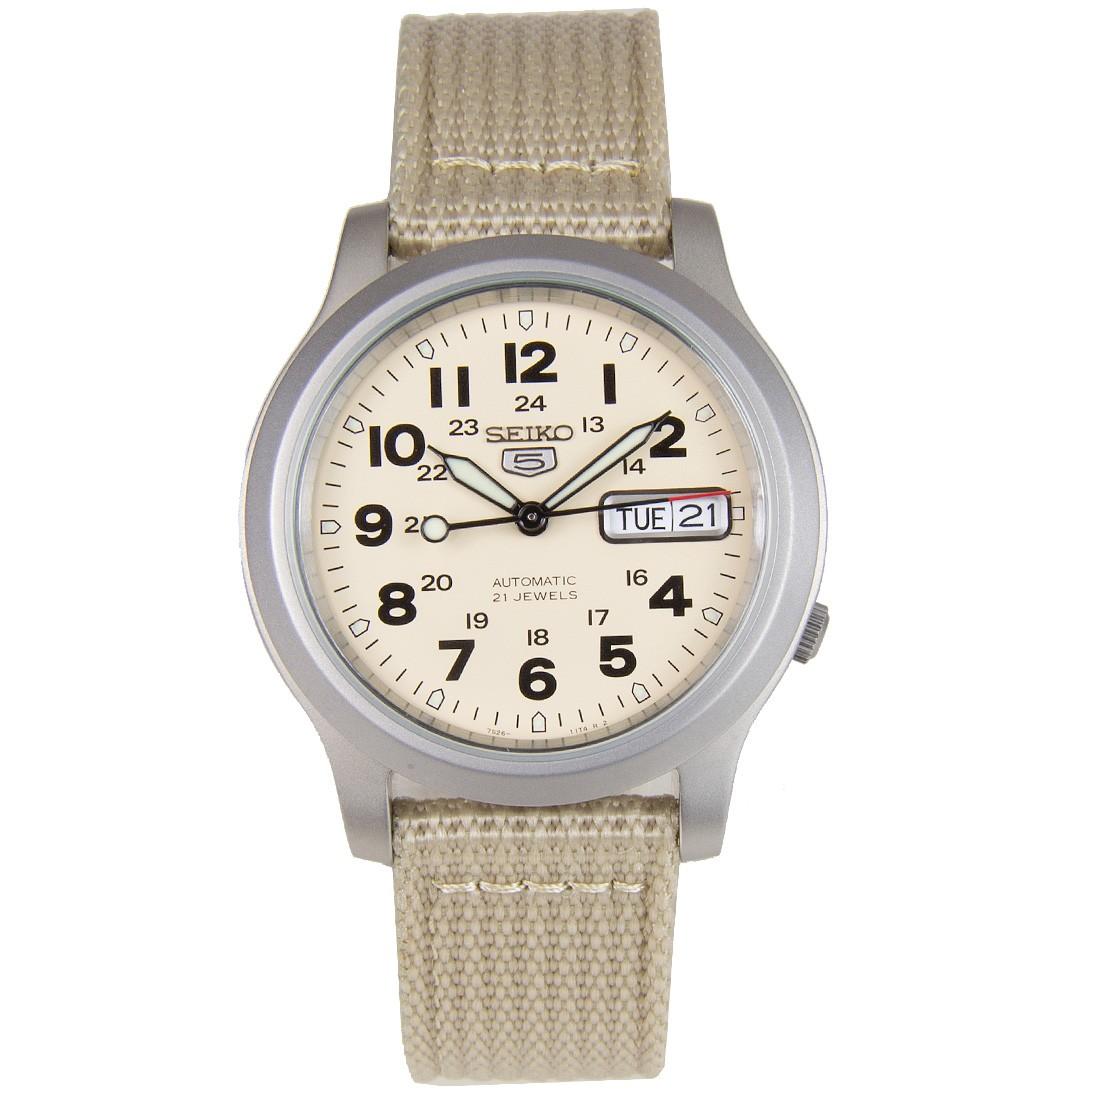 Đồng hồ Seiko SNKN27K1 (2)